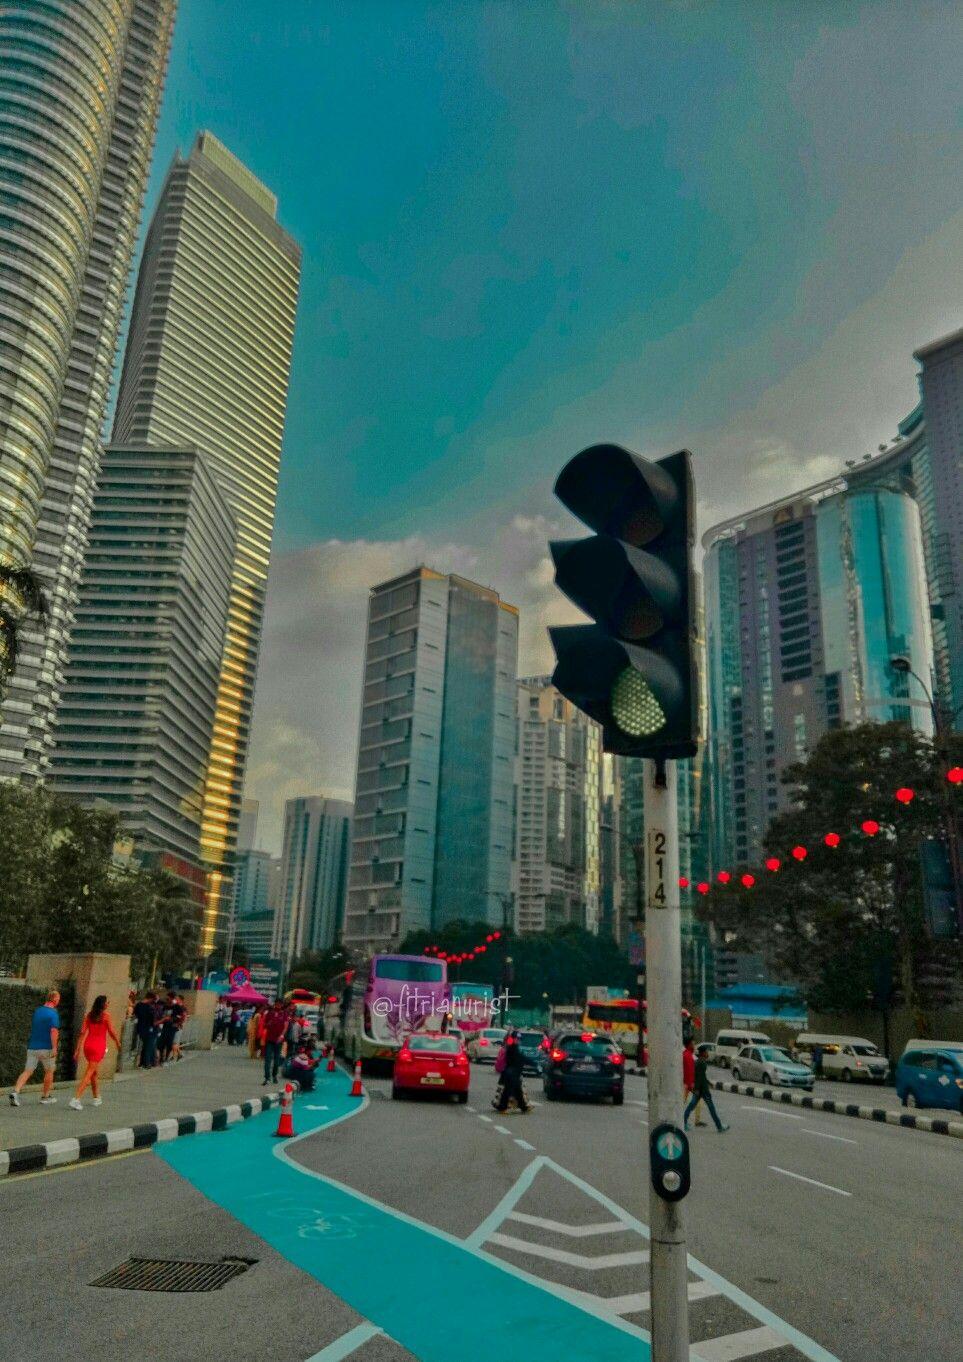 Kuala Lumpur City Centre 50088 Kuala Lumpur Federal Territory Of Kuala Lumpur Malaysia Kualalumpur Hotel Murah Malaysia Wisma T Di 2020 Gedung Jalan Lumpur